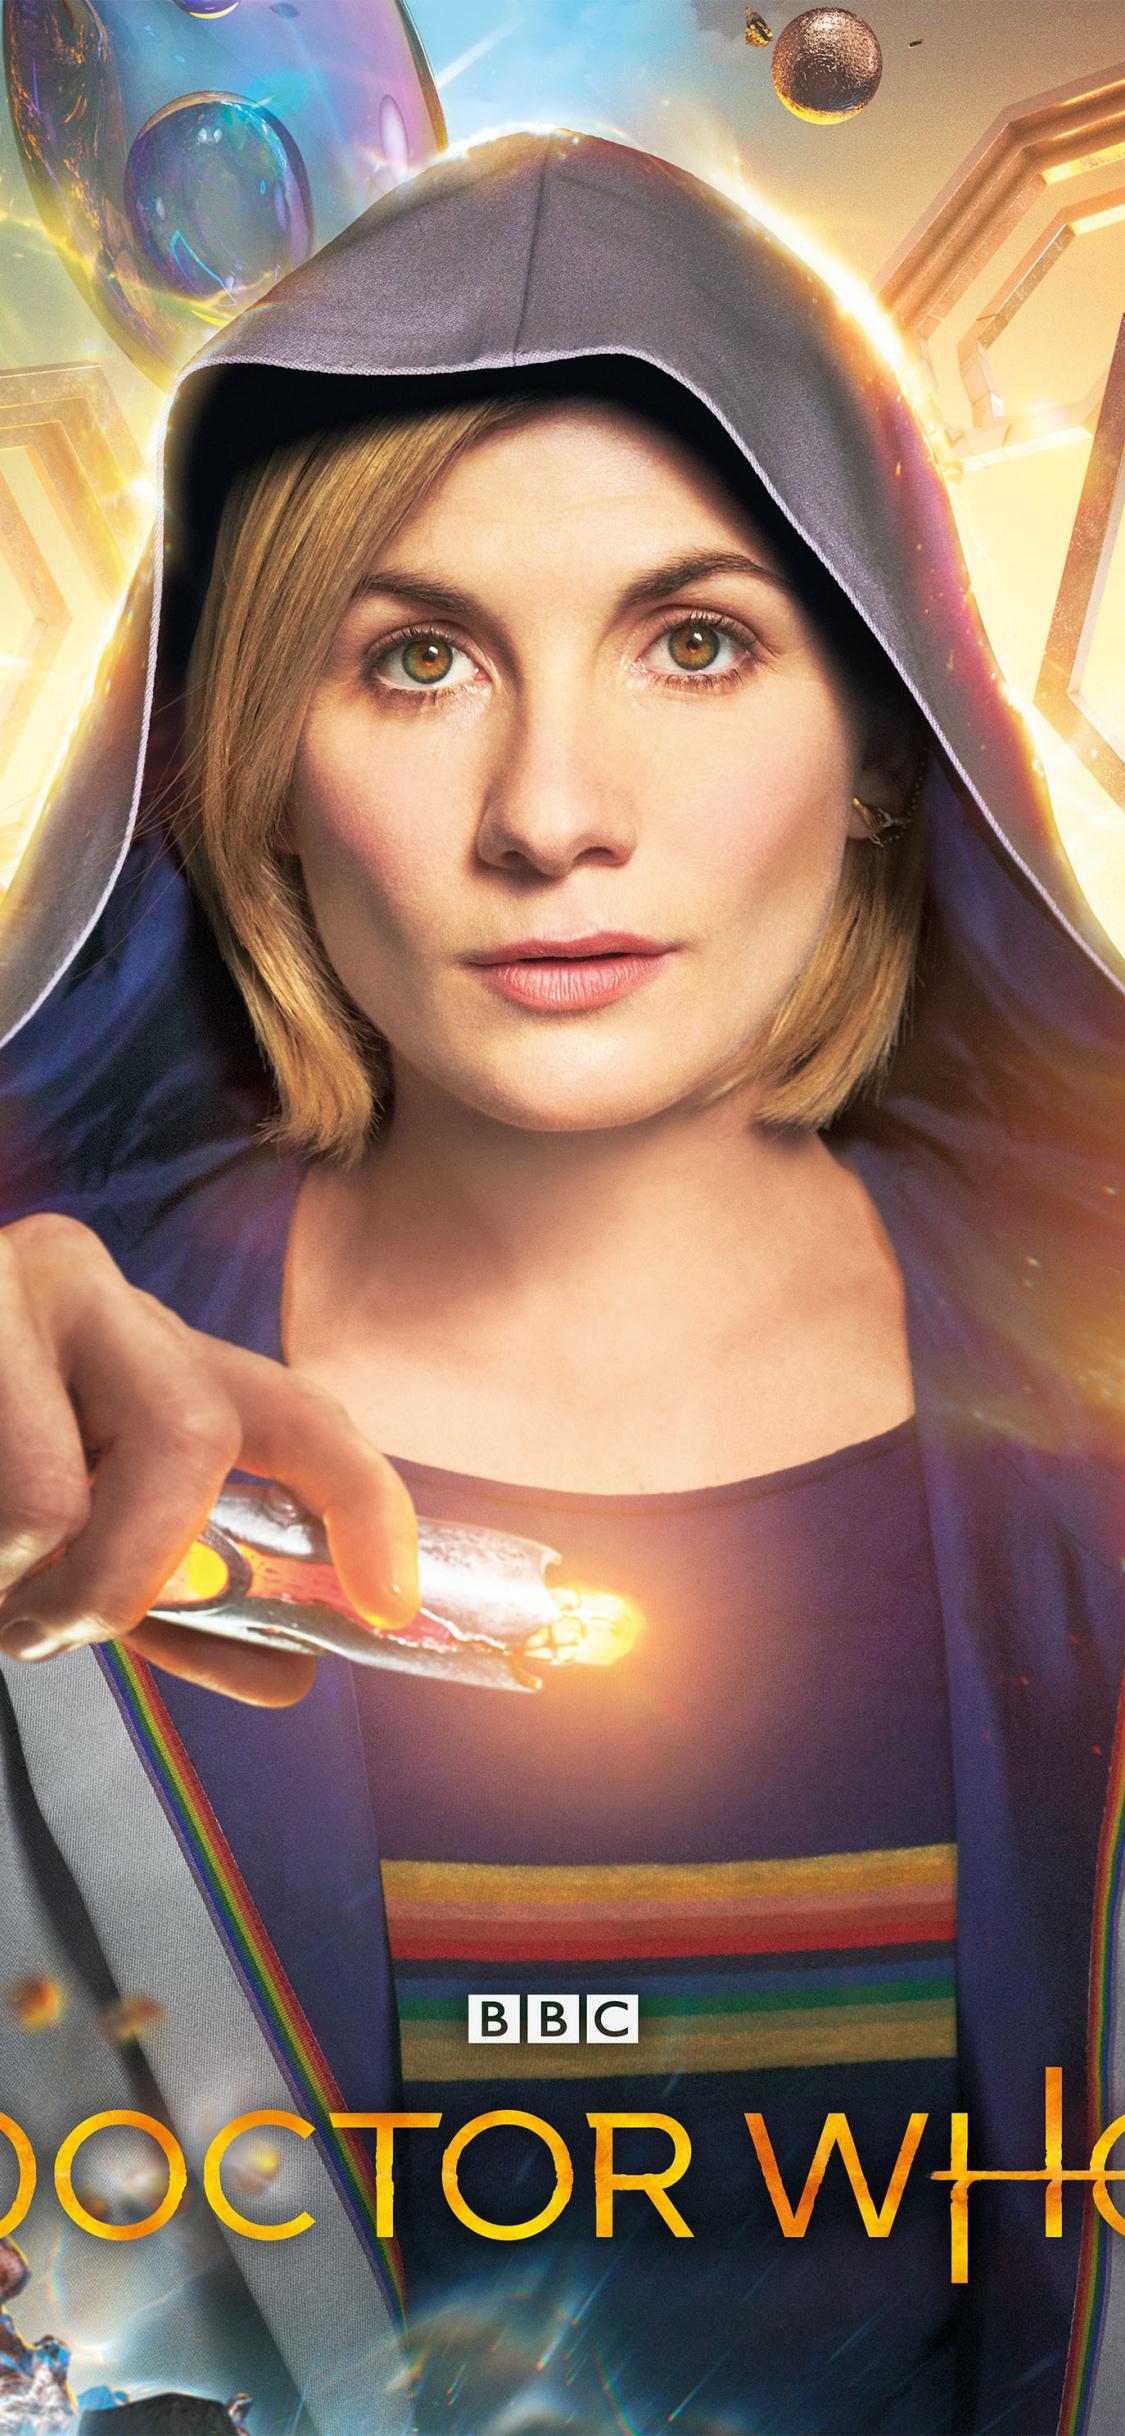 Download 1125x2436 Wallpaper Doctor Who Season 11 Tv Show